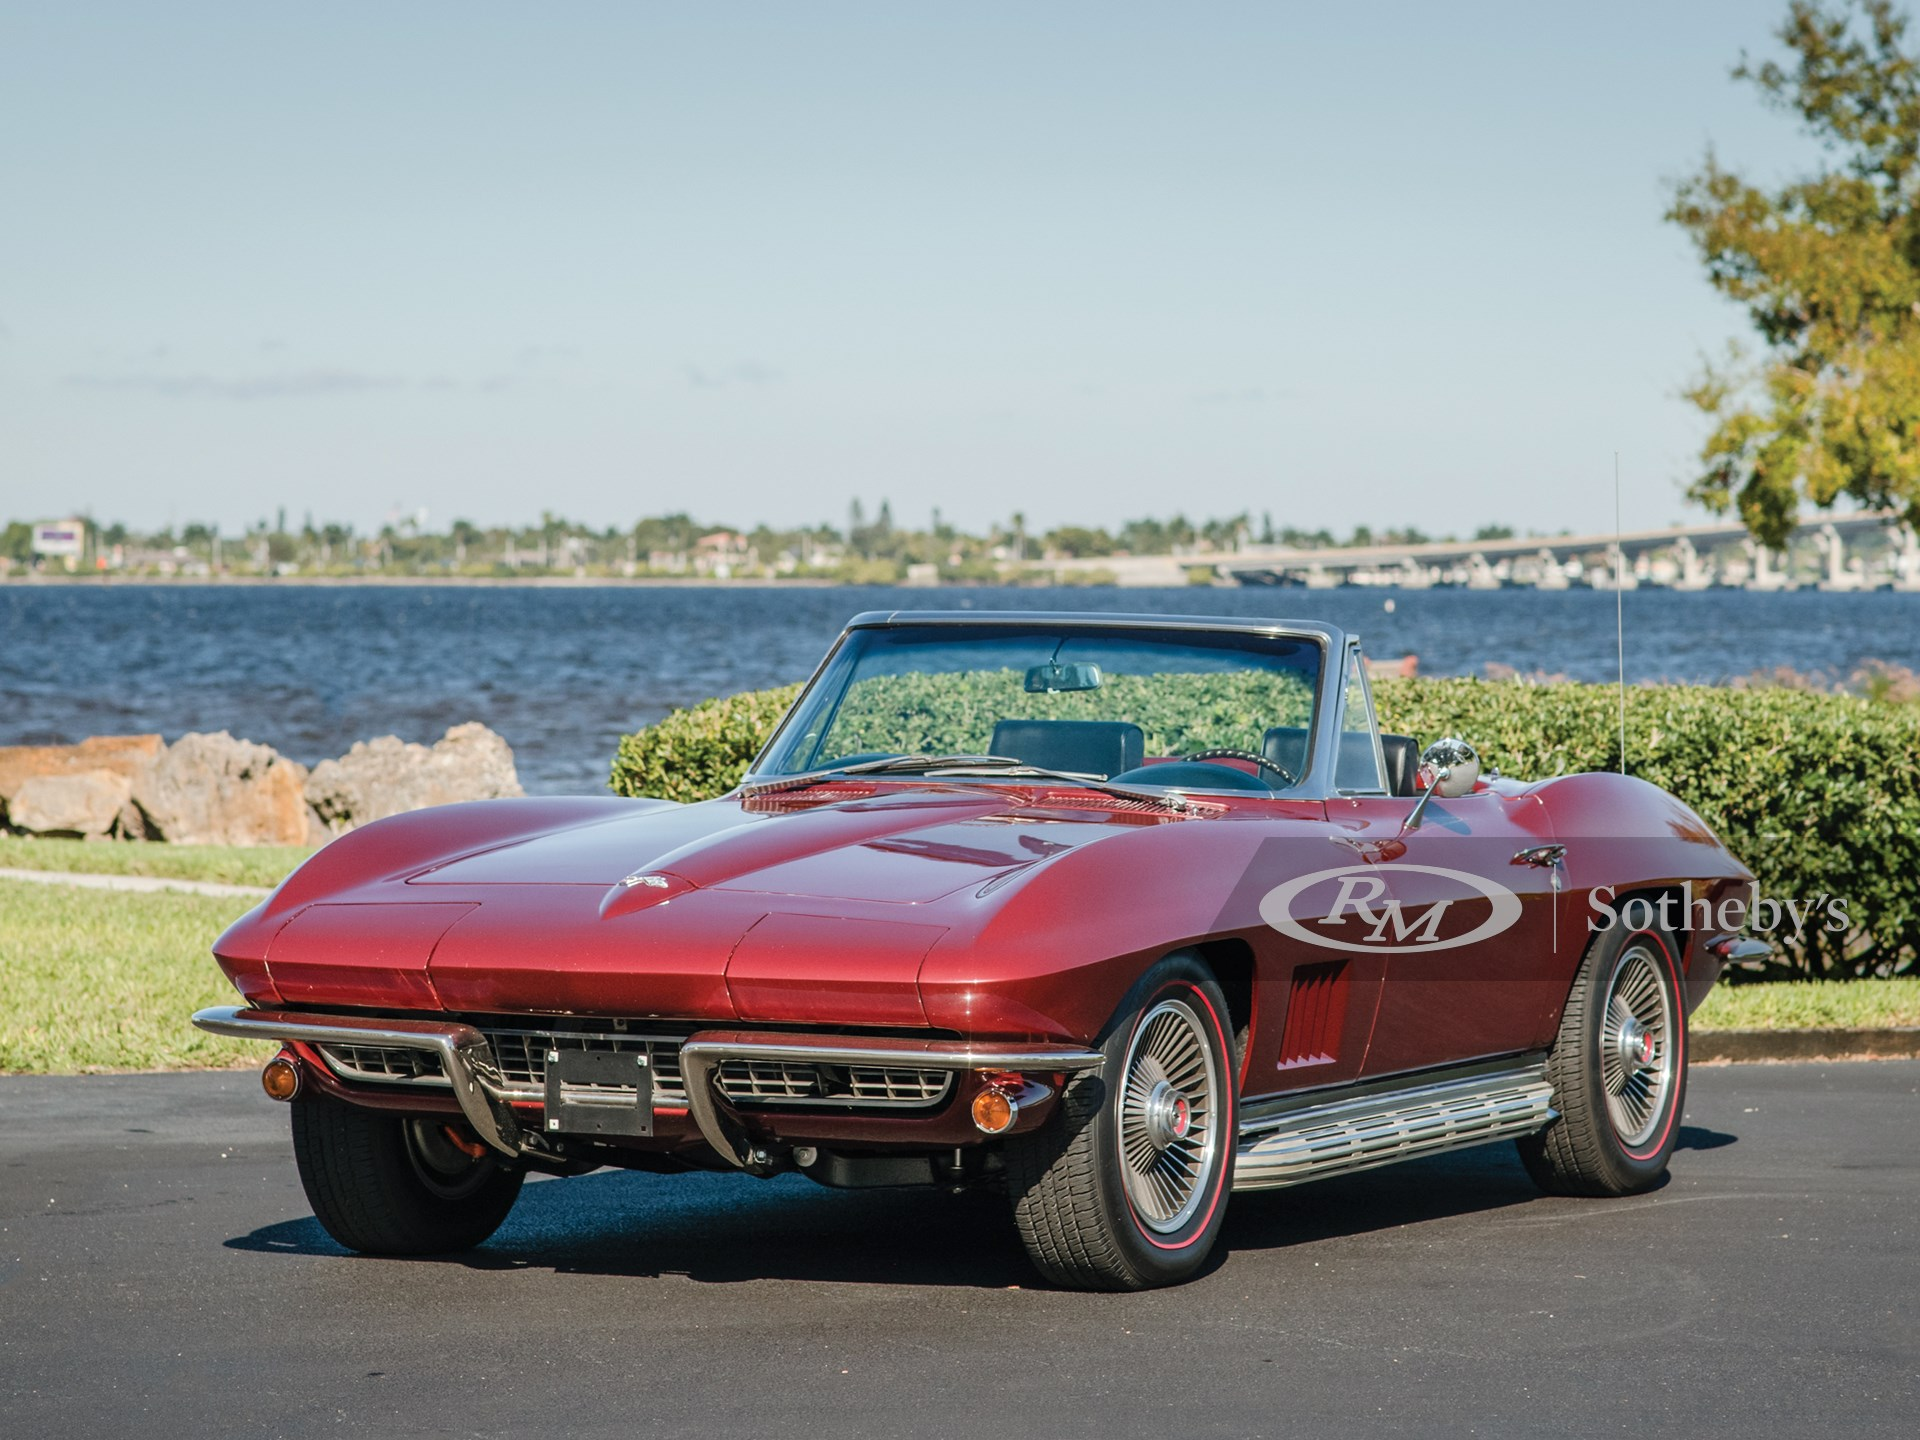 1967 Chevrolet Corvette Sting Ray Convertible  -